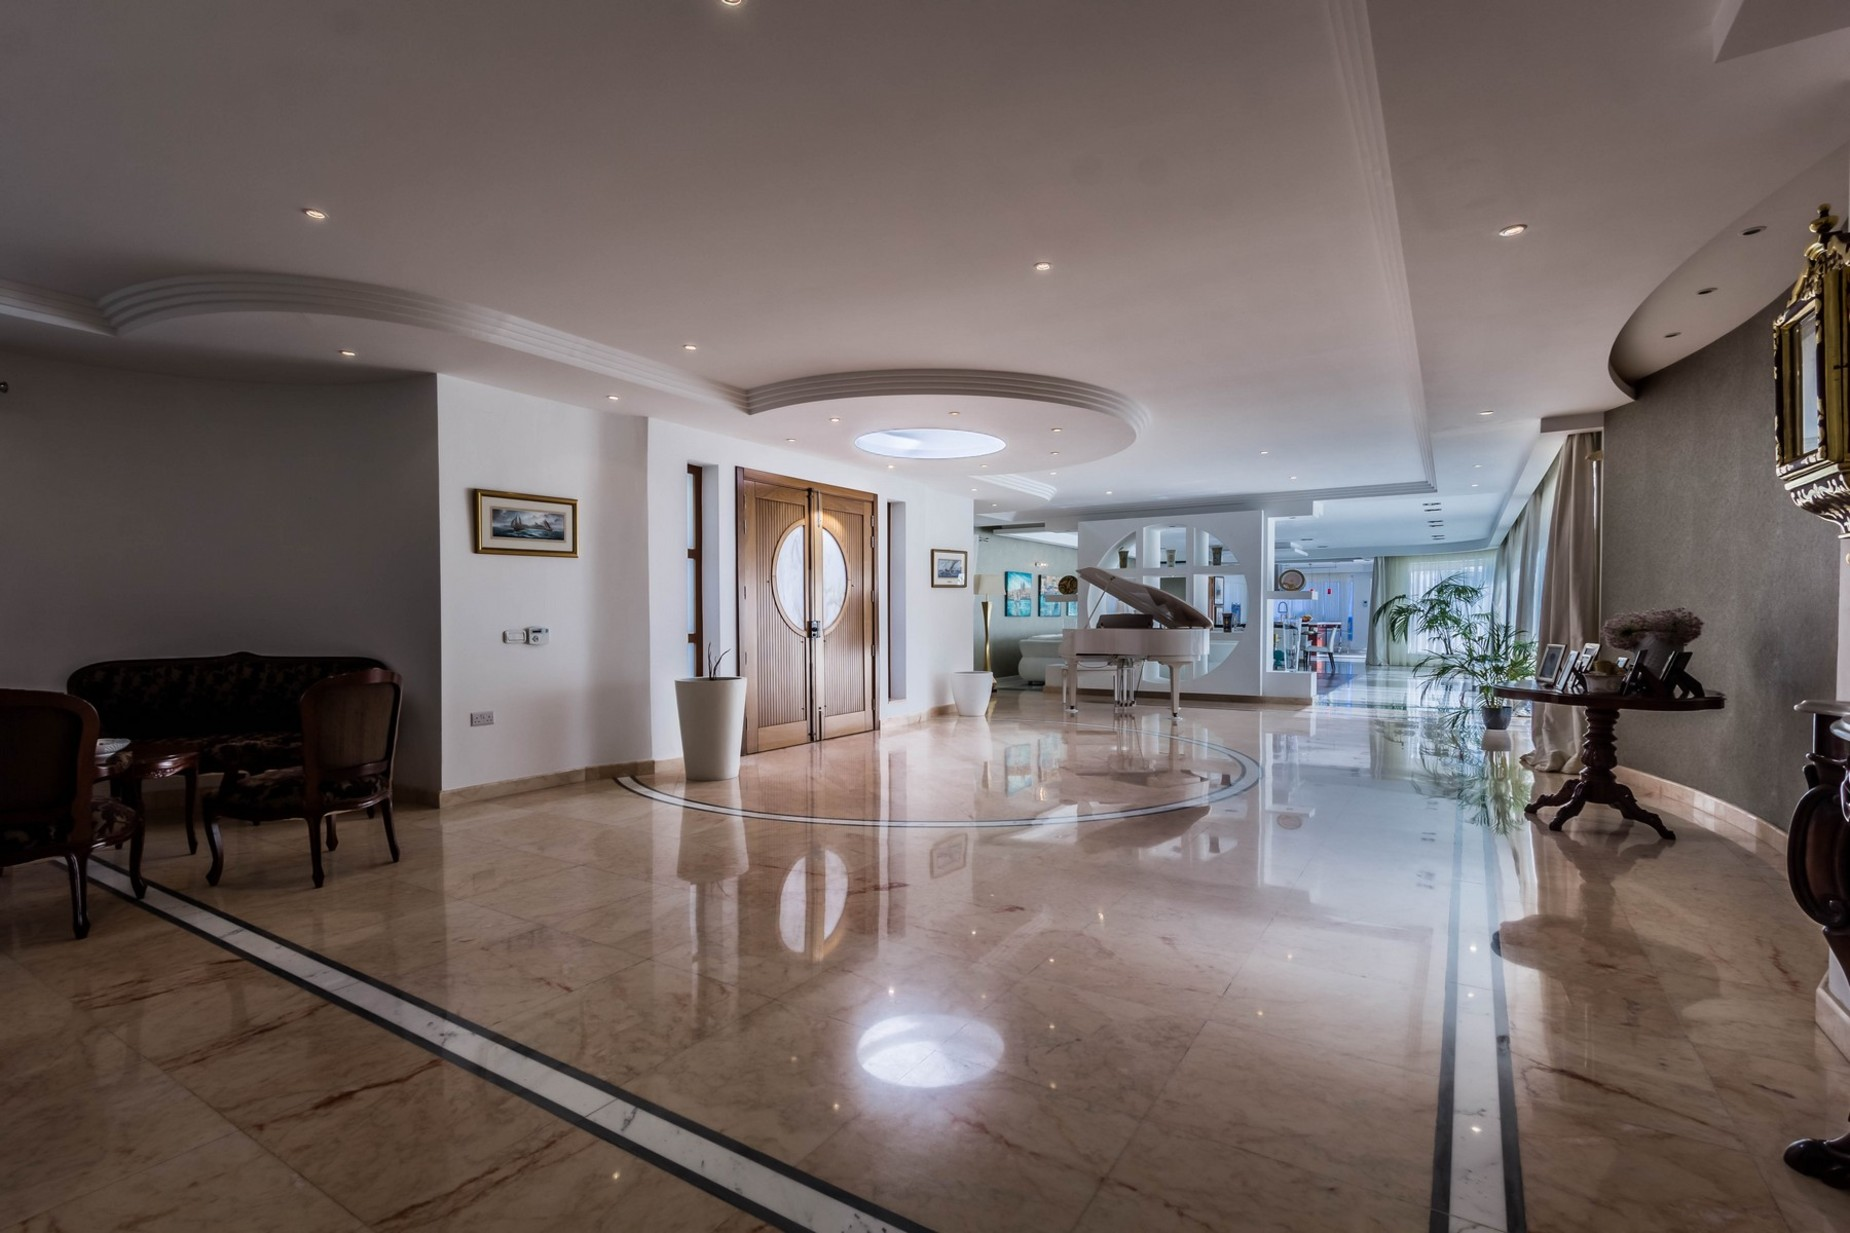 4 bed Villa For Rent in Marsascala, Marsascala - thumb 8